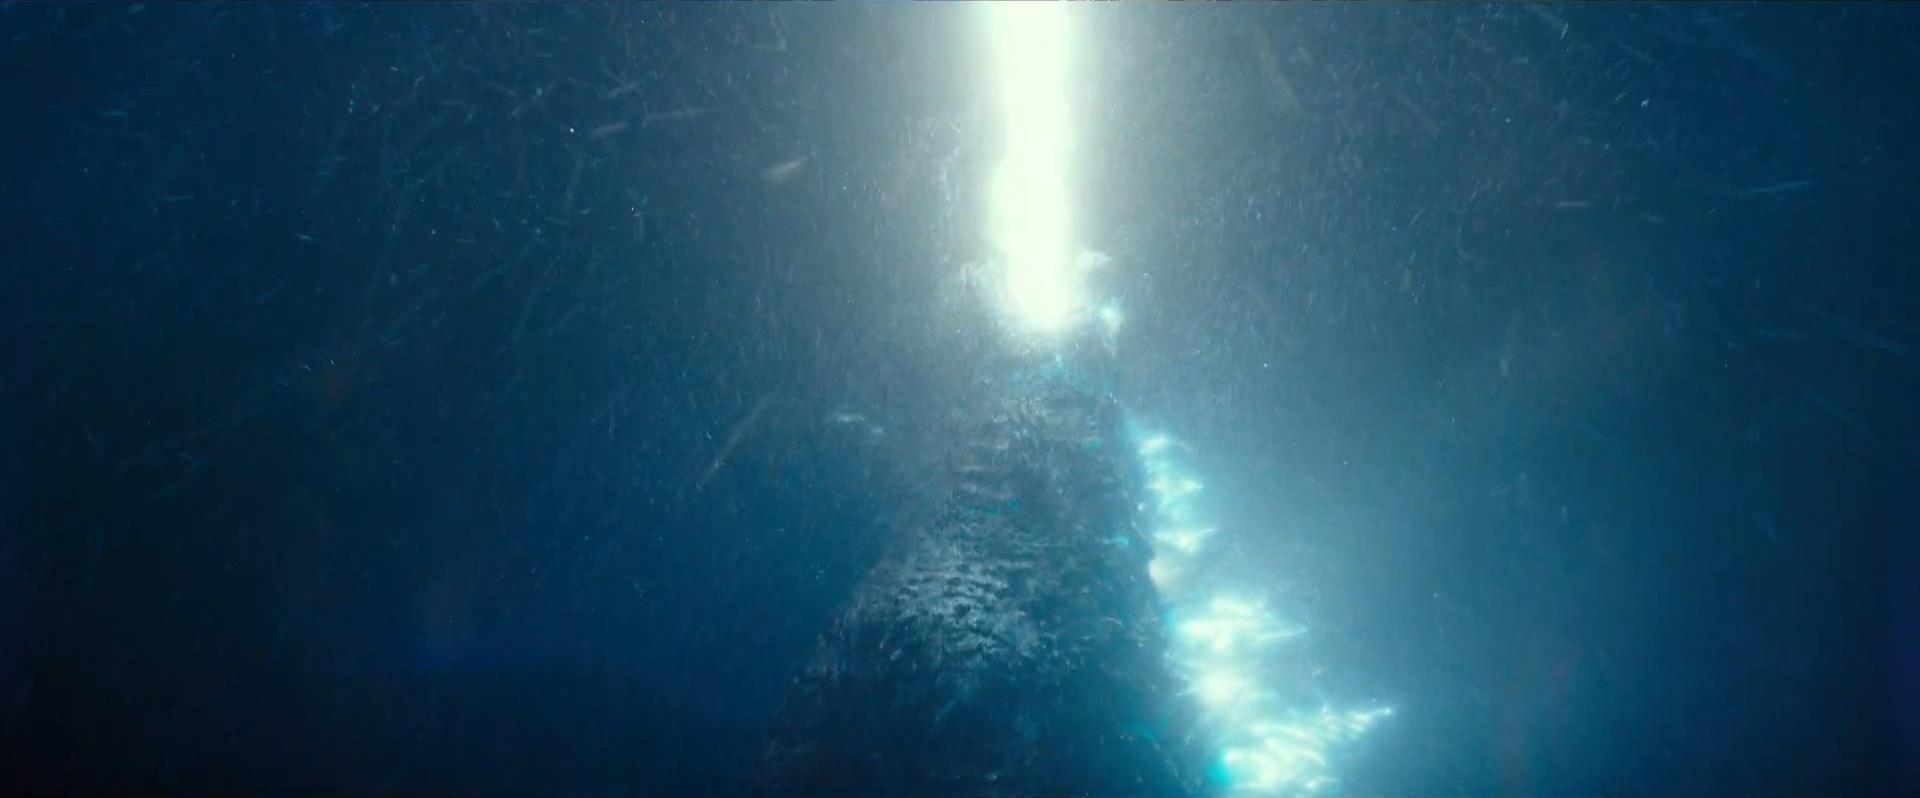 Godzilla vs Kong Trailer Still 46 - Godzilla fires atomic breath